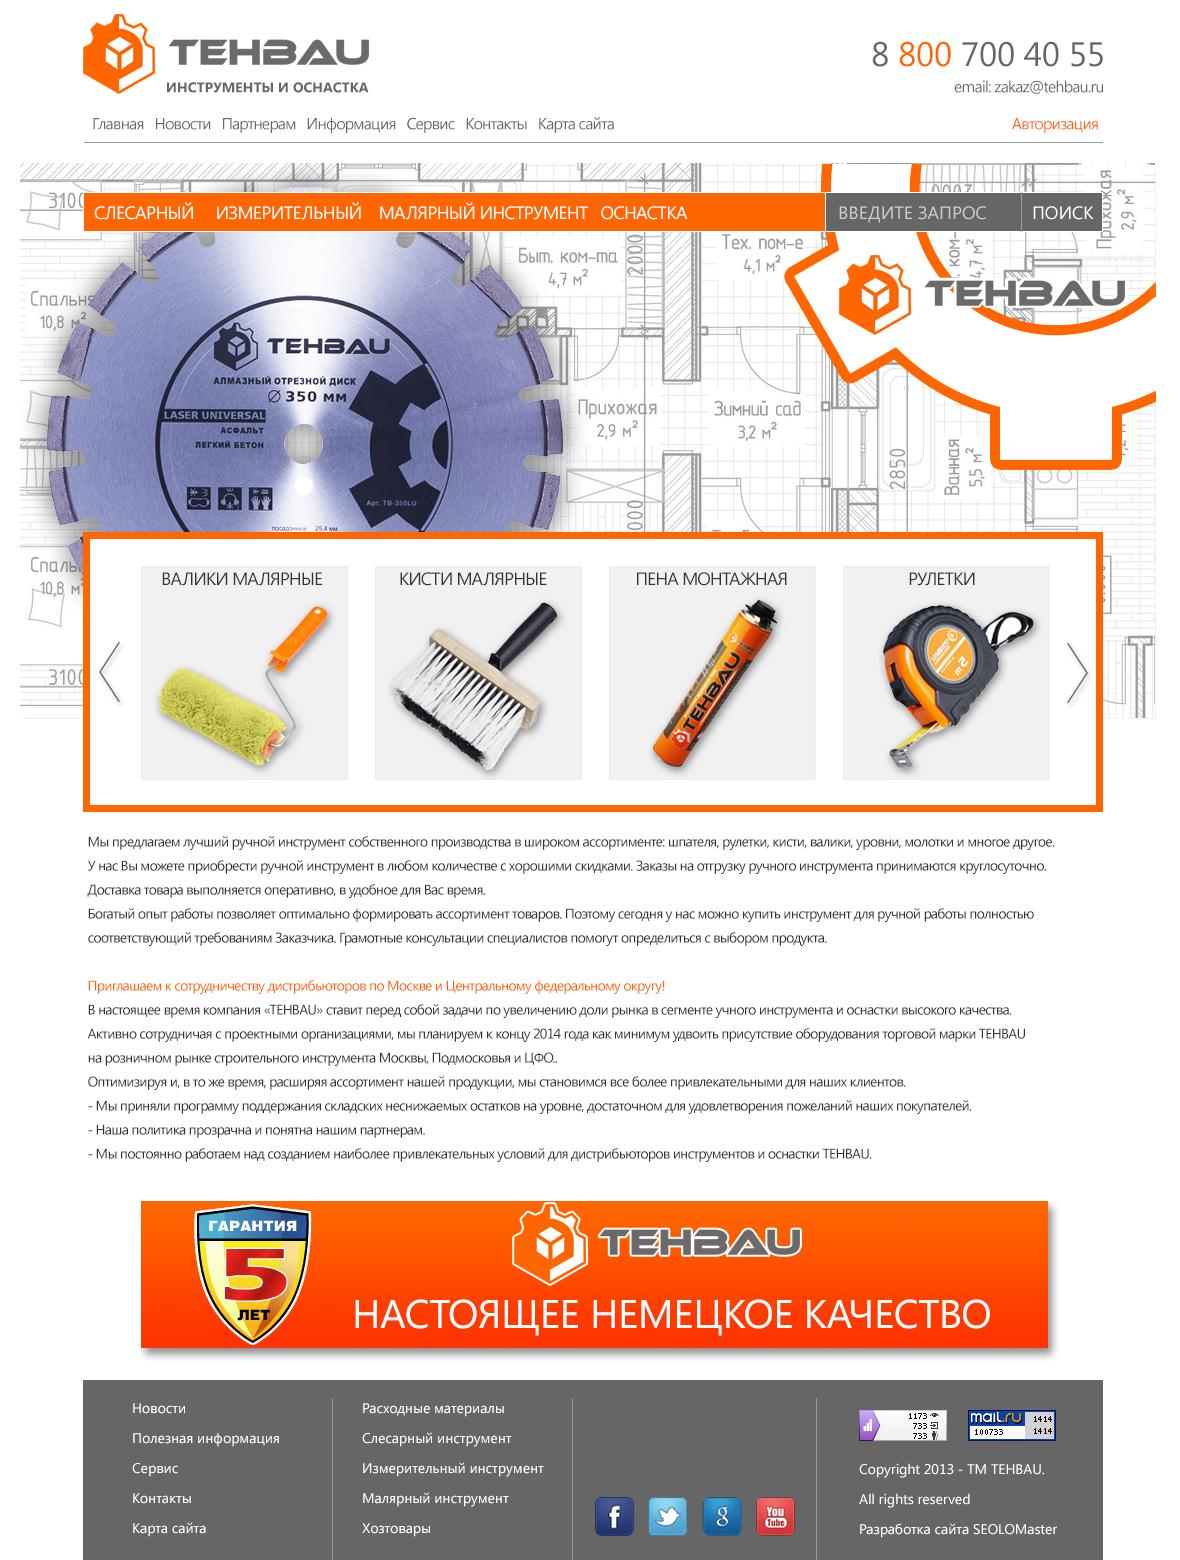 сайт TEHBAU - инструмент и оснастка